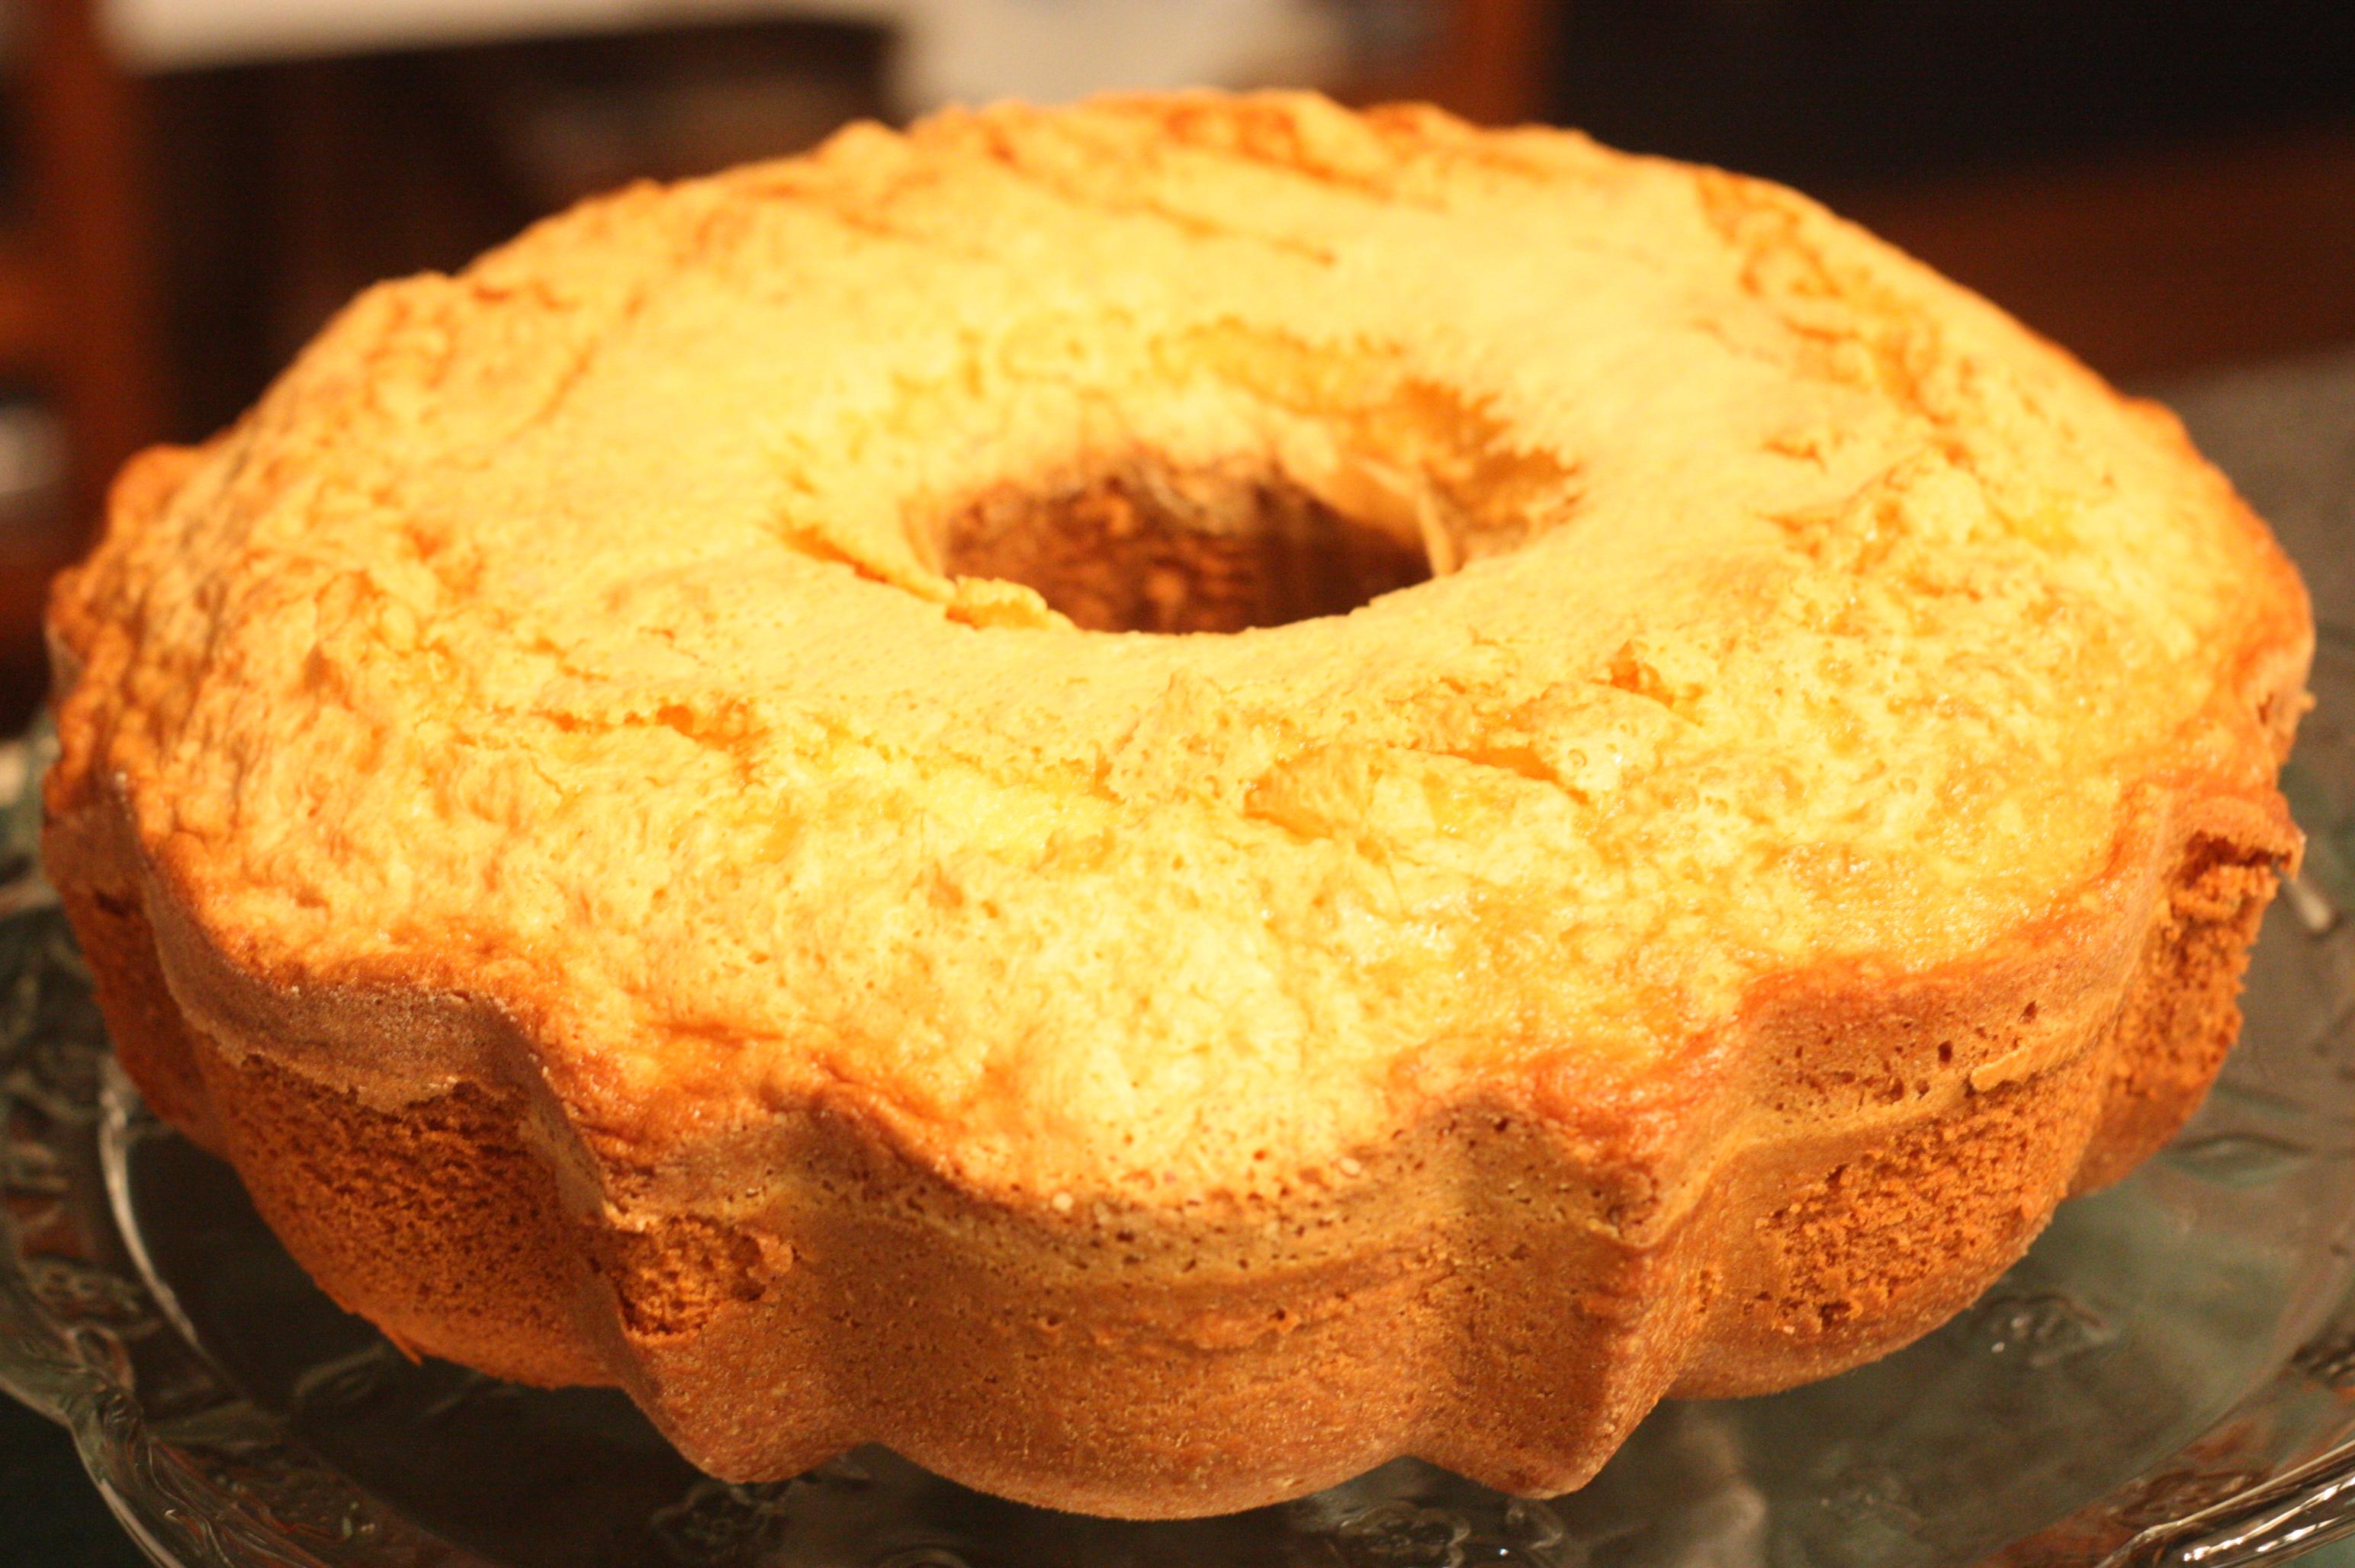 Crusty cakes